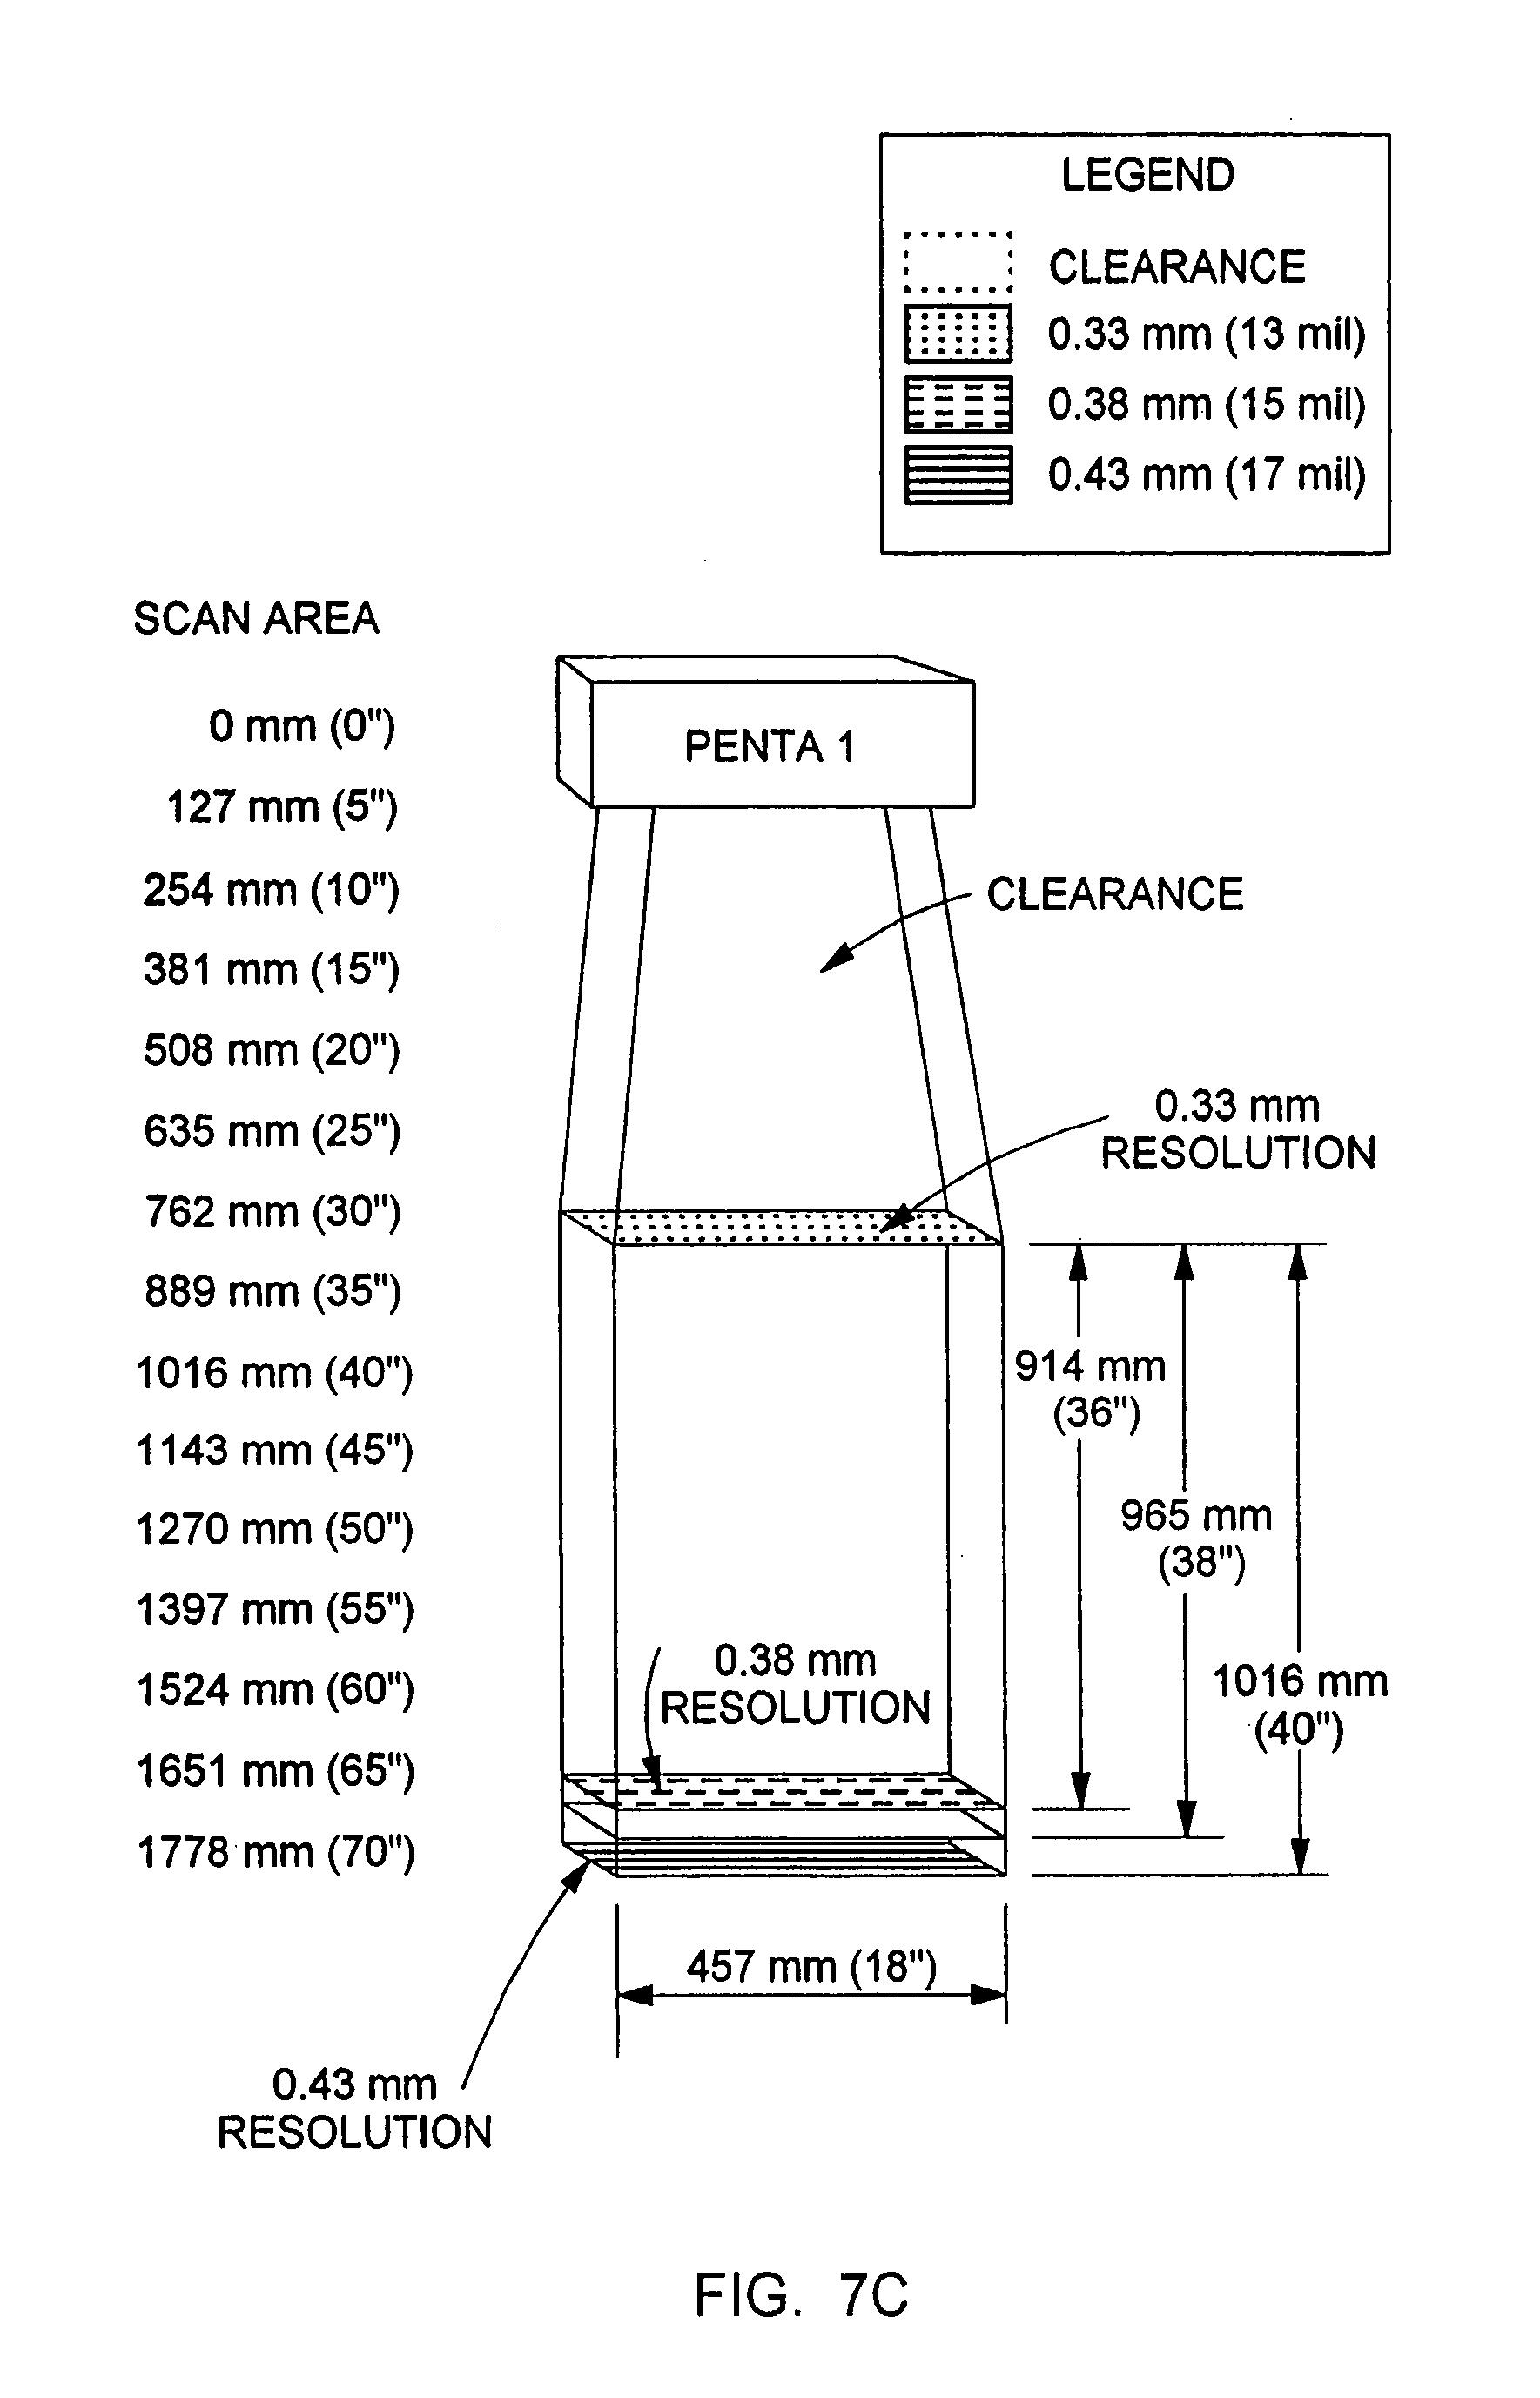 Patent Us 7527205 B2 Pic16f88 Tachometer Circuit Led And Display Indicator Images